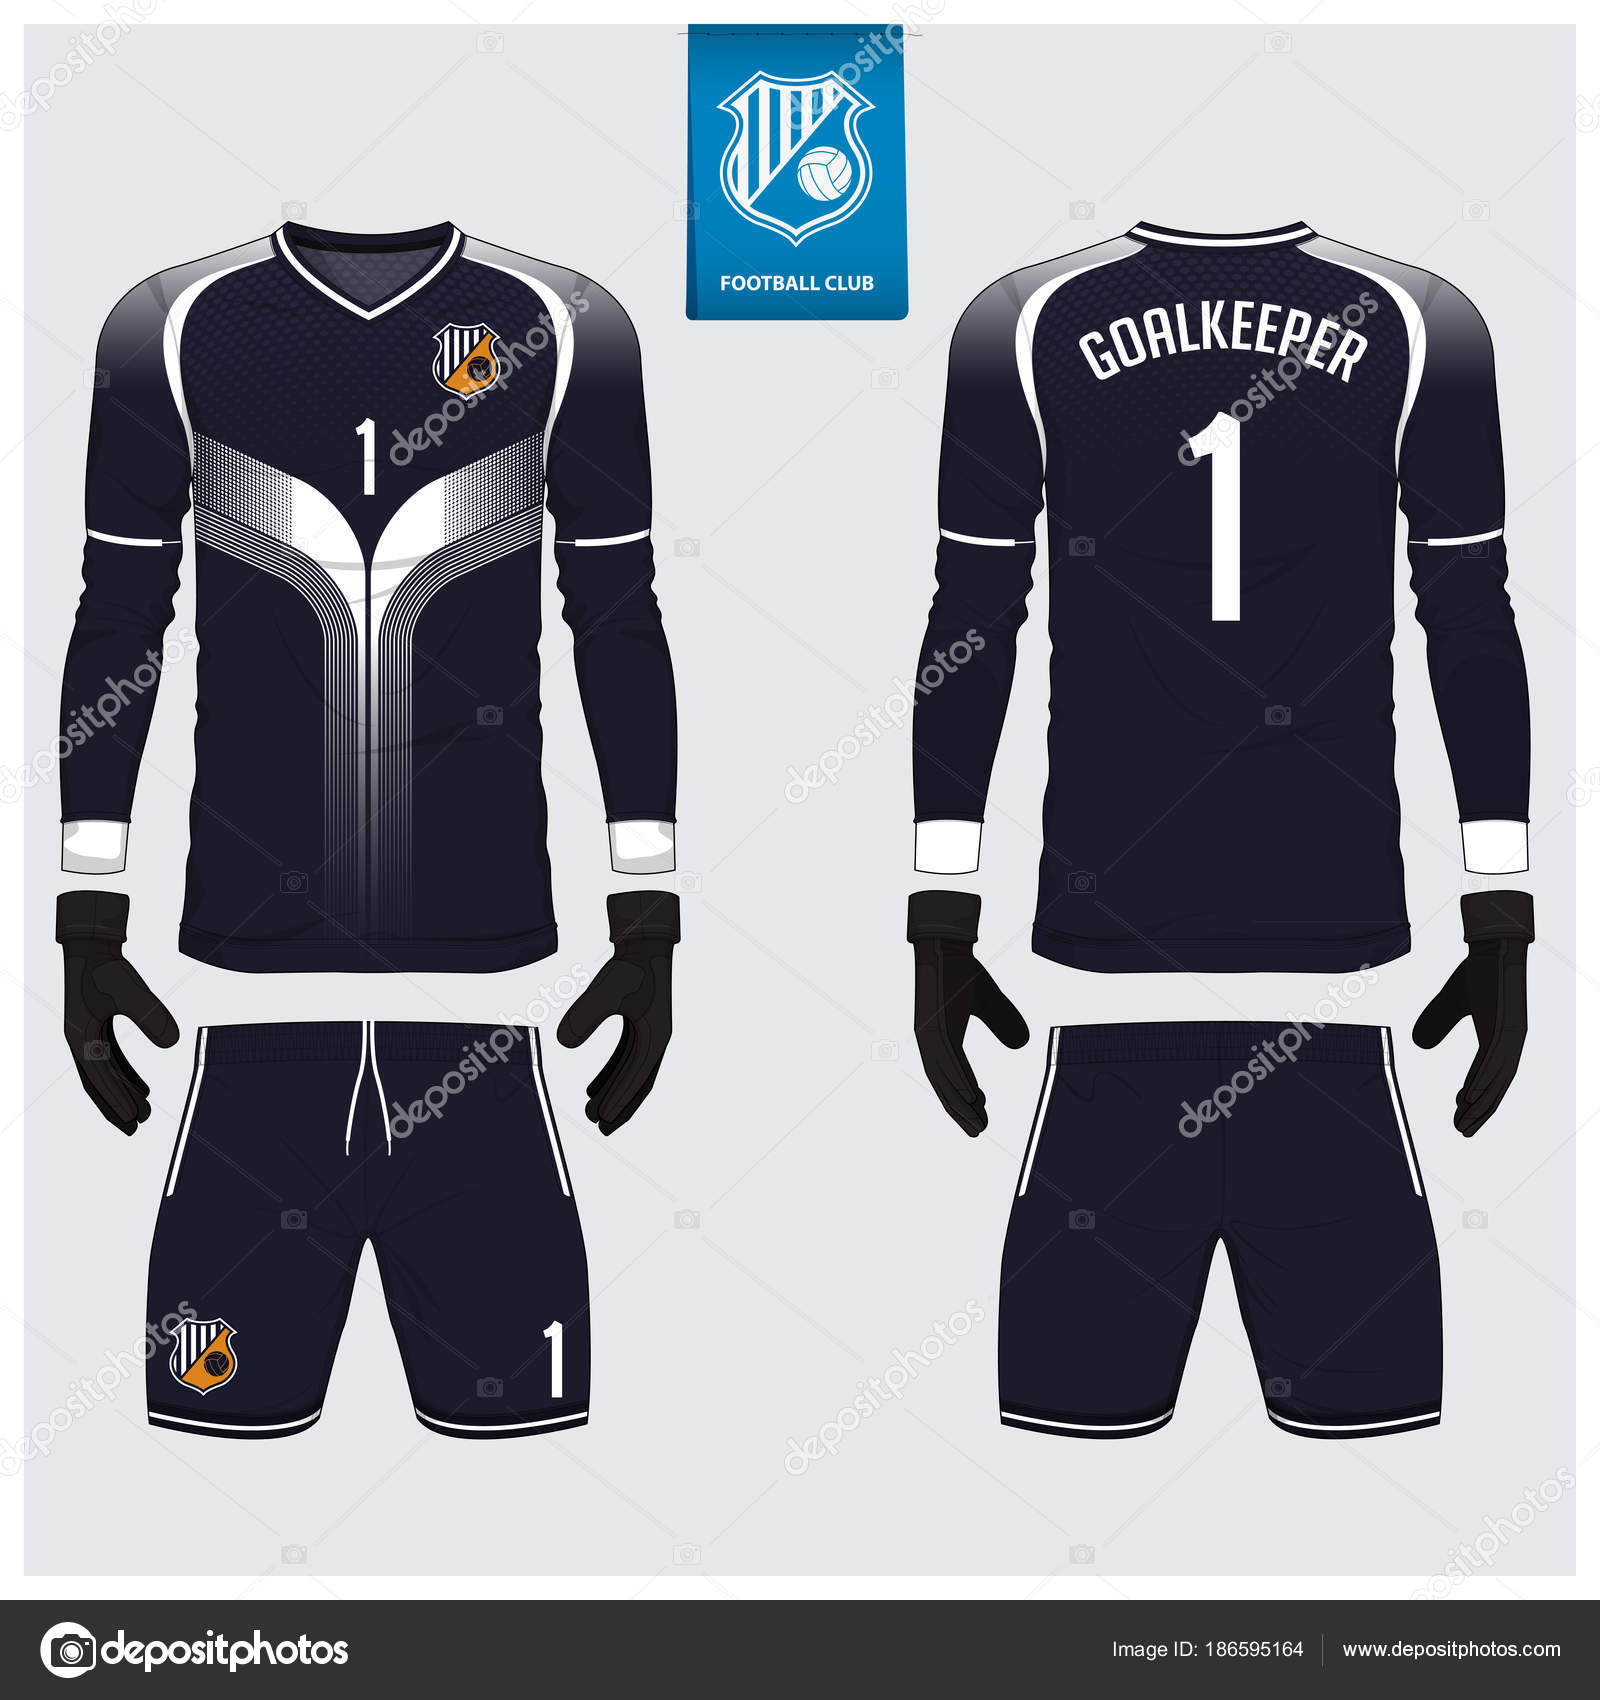 Negro y kit de fútbol o jersey blanco portero 521eeacc3cacf